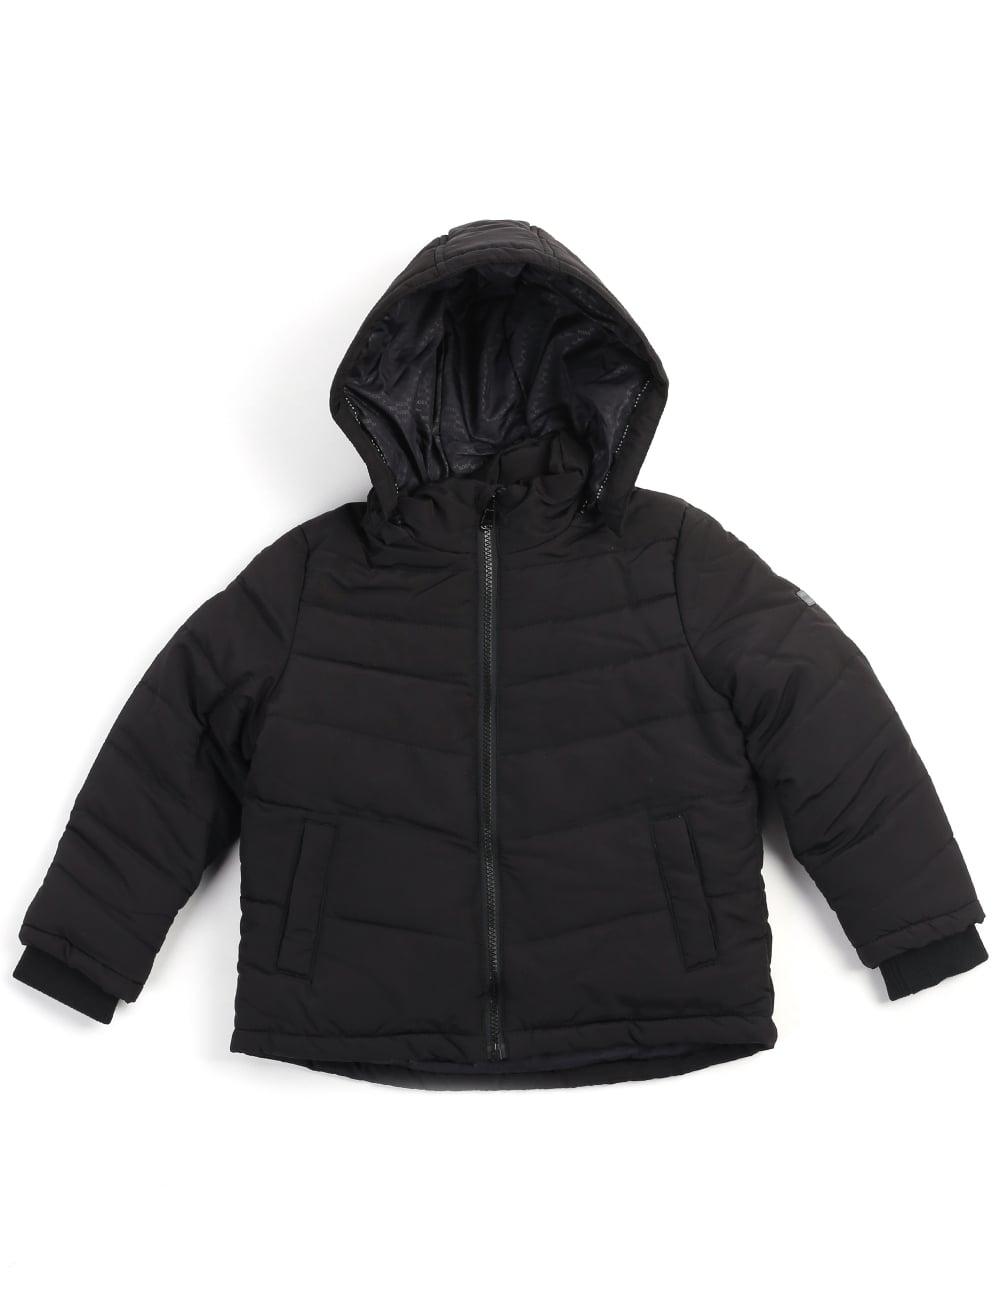 ef5711bb8fcc Hugo Boss Boys Youth Zip Through Jacket